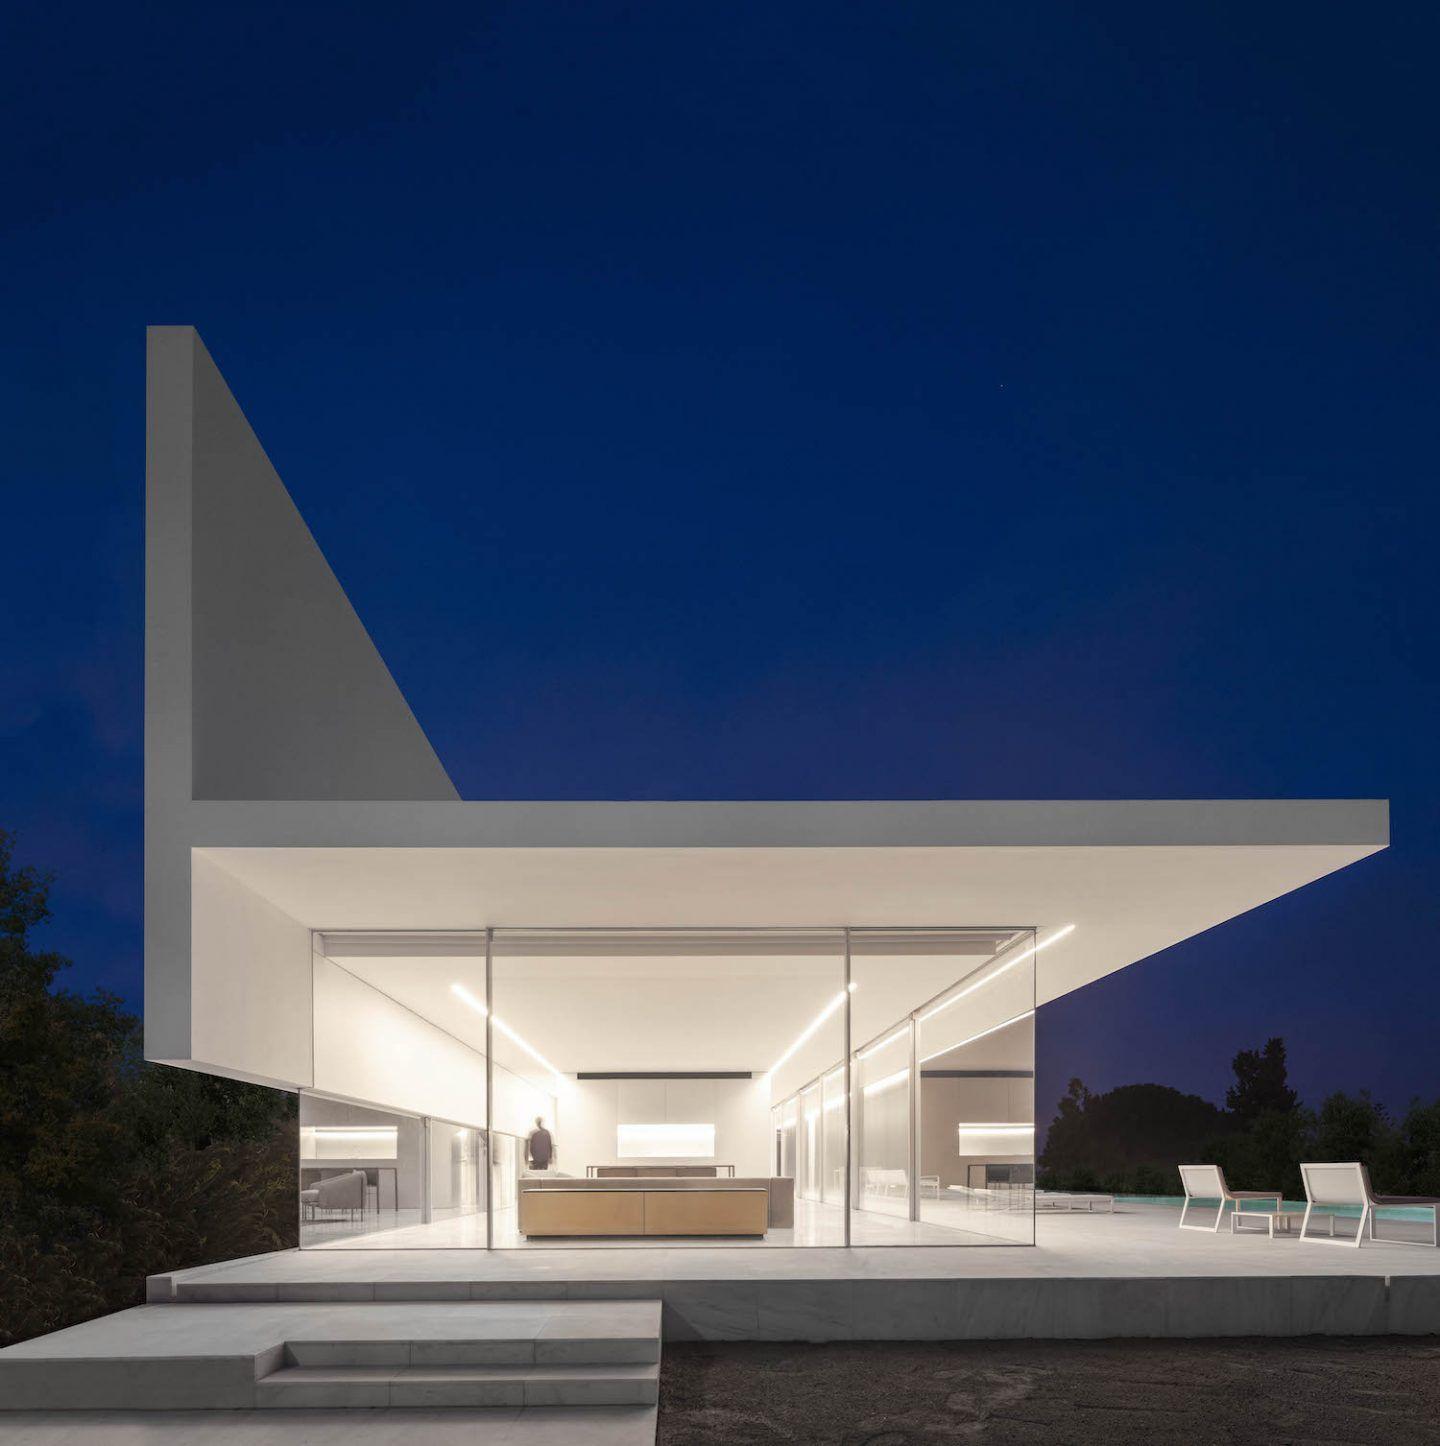 IGNANT-Architecture-Fran-Silvestre-Arquitectos-Hofmann-House-3